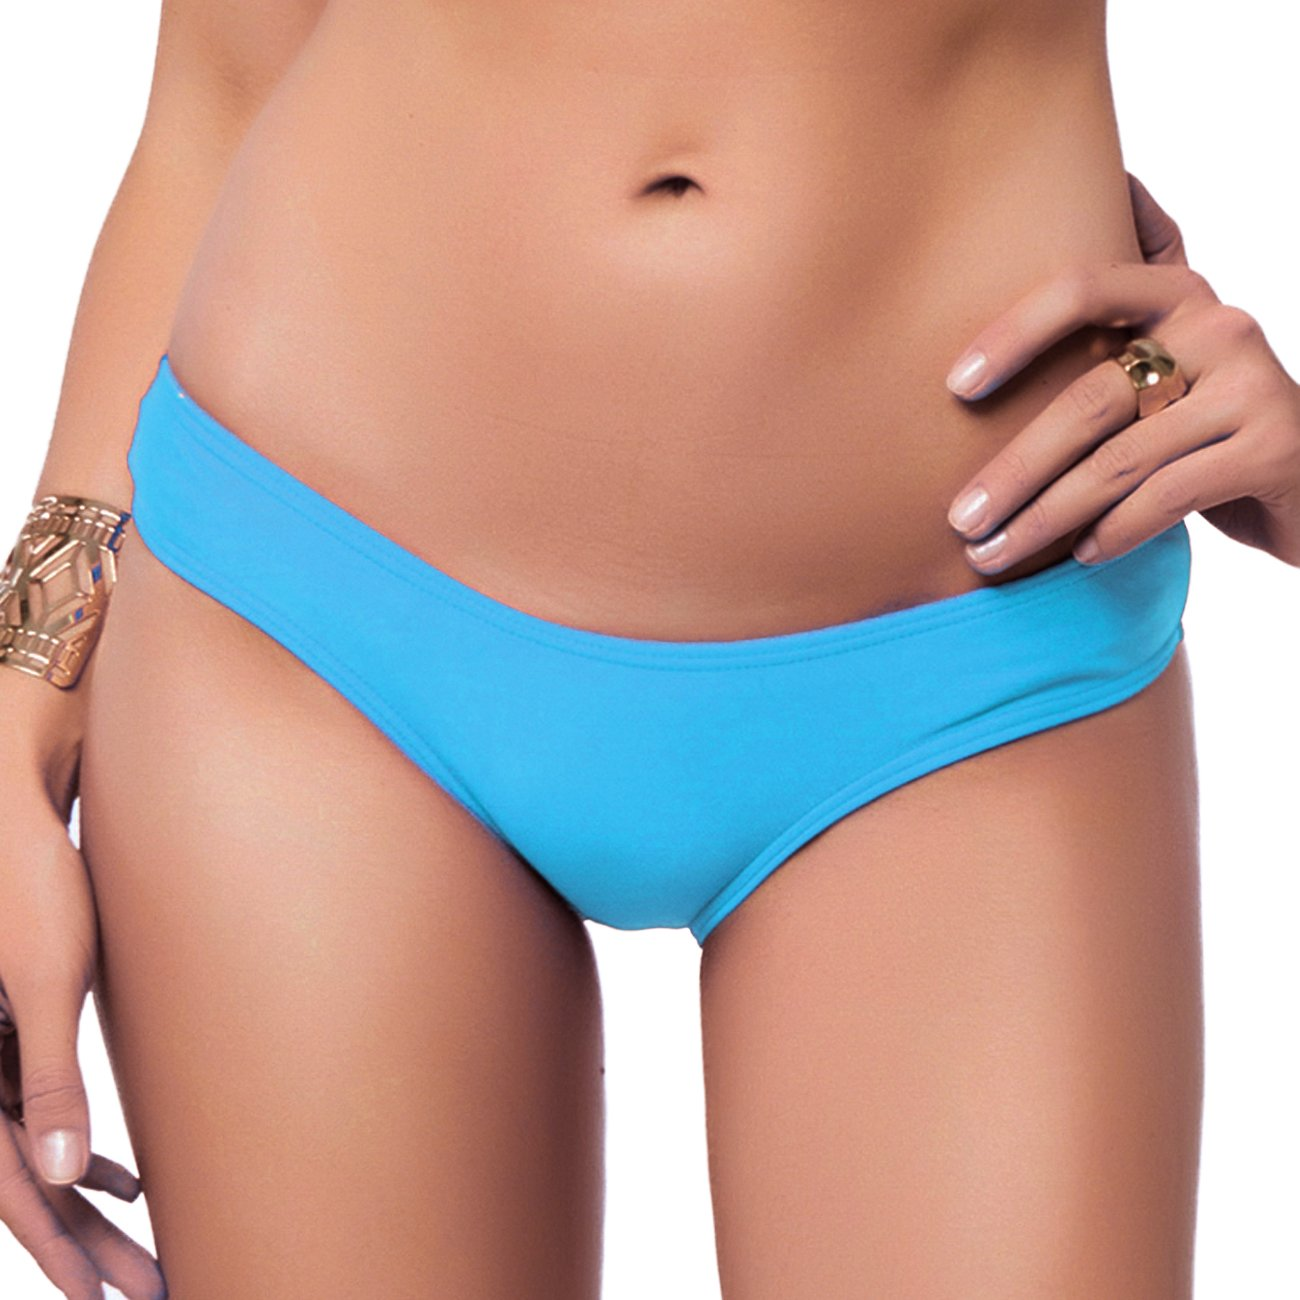 dc941fafa0ee4 Sexy Brazilian Bikini Bottom for women V Cheeky T-Back Booty Solid Classic Ladies  Swimsuit